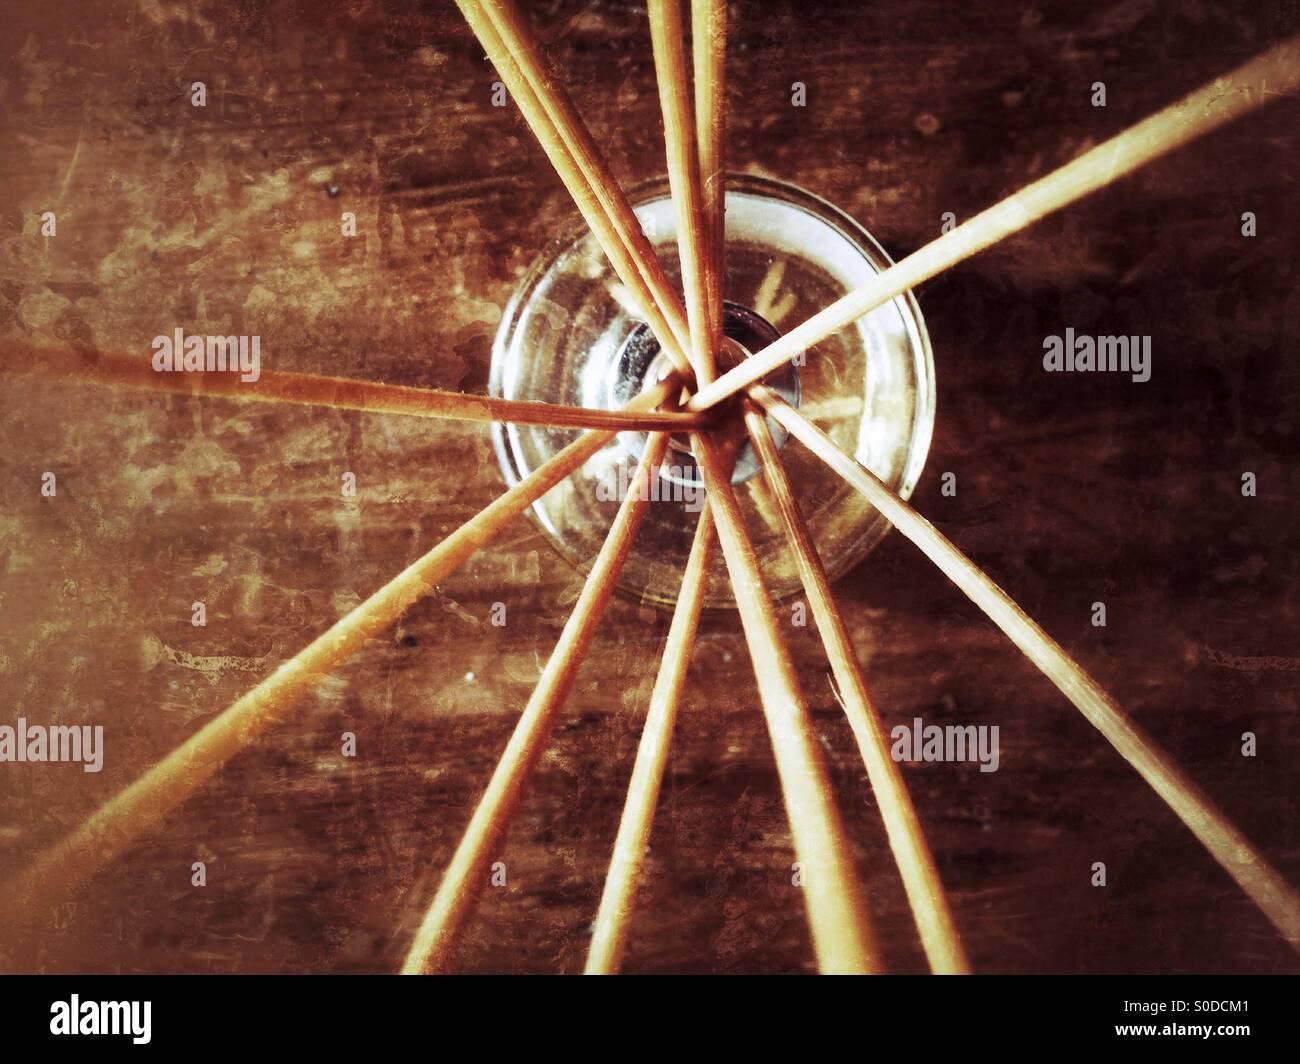 Scented sticks - Stock Image